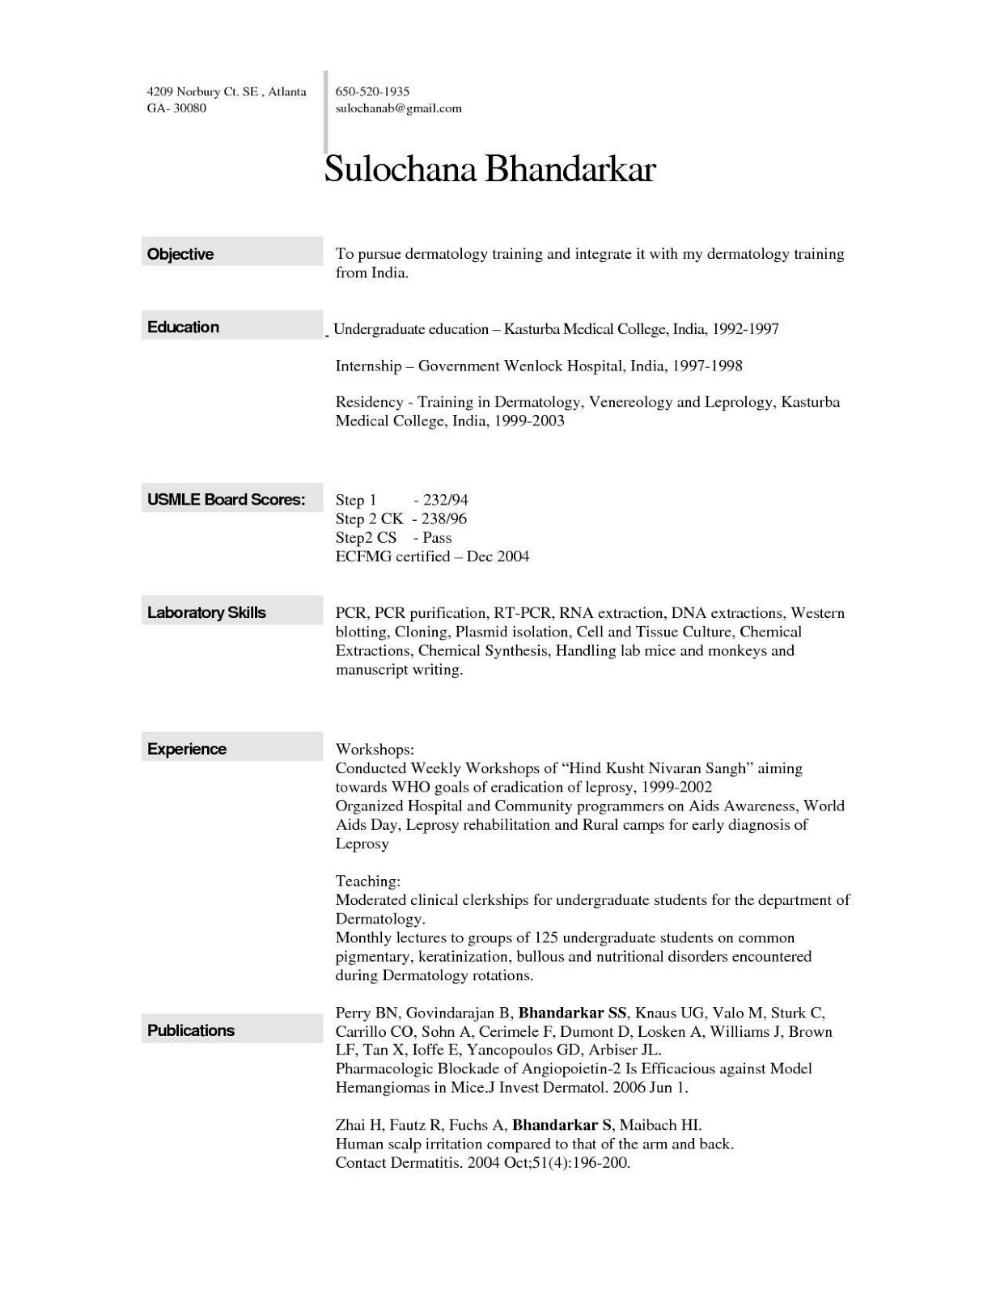 biodata model biodata model pdf 2020 biodata model for job